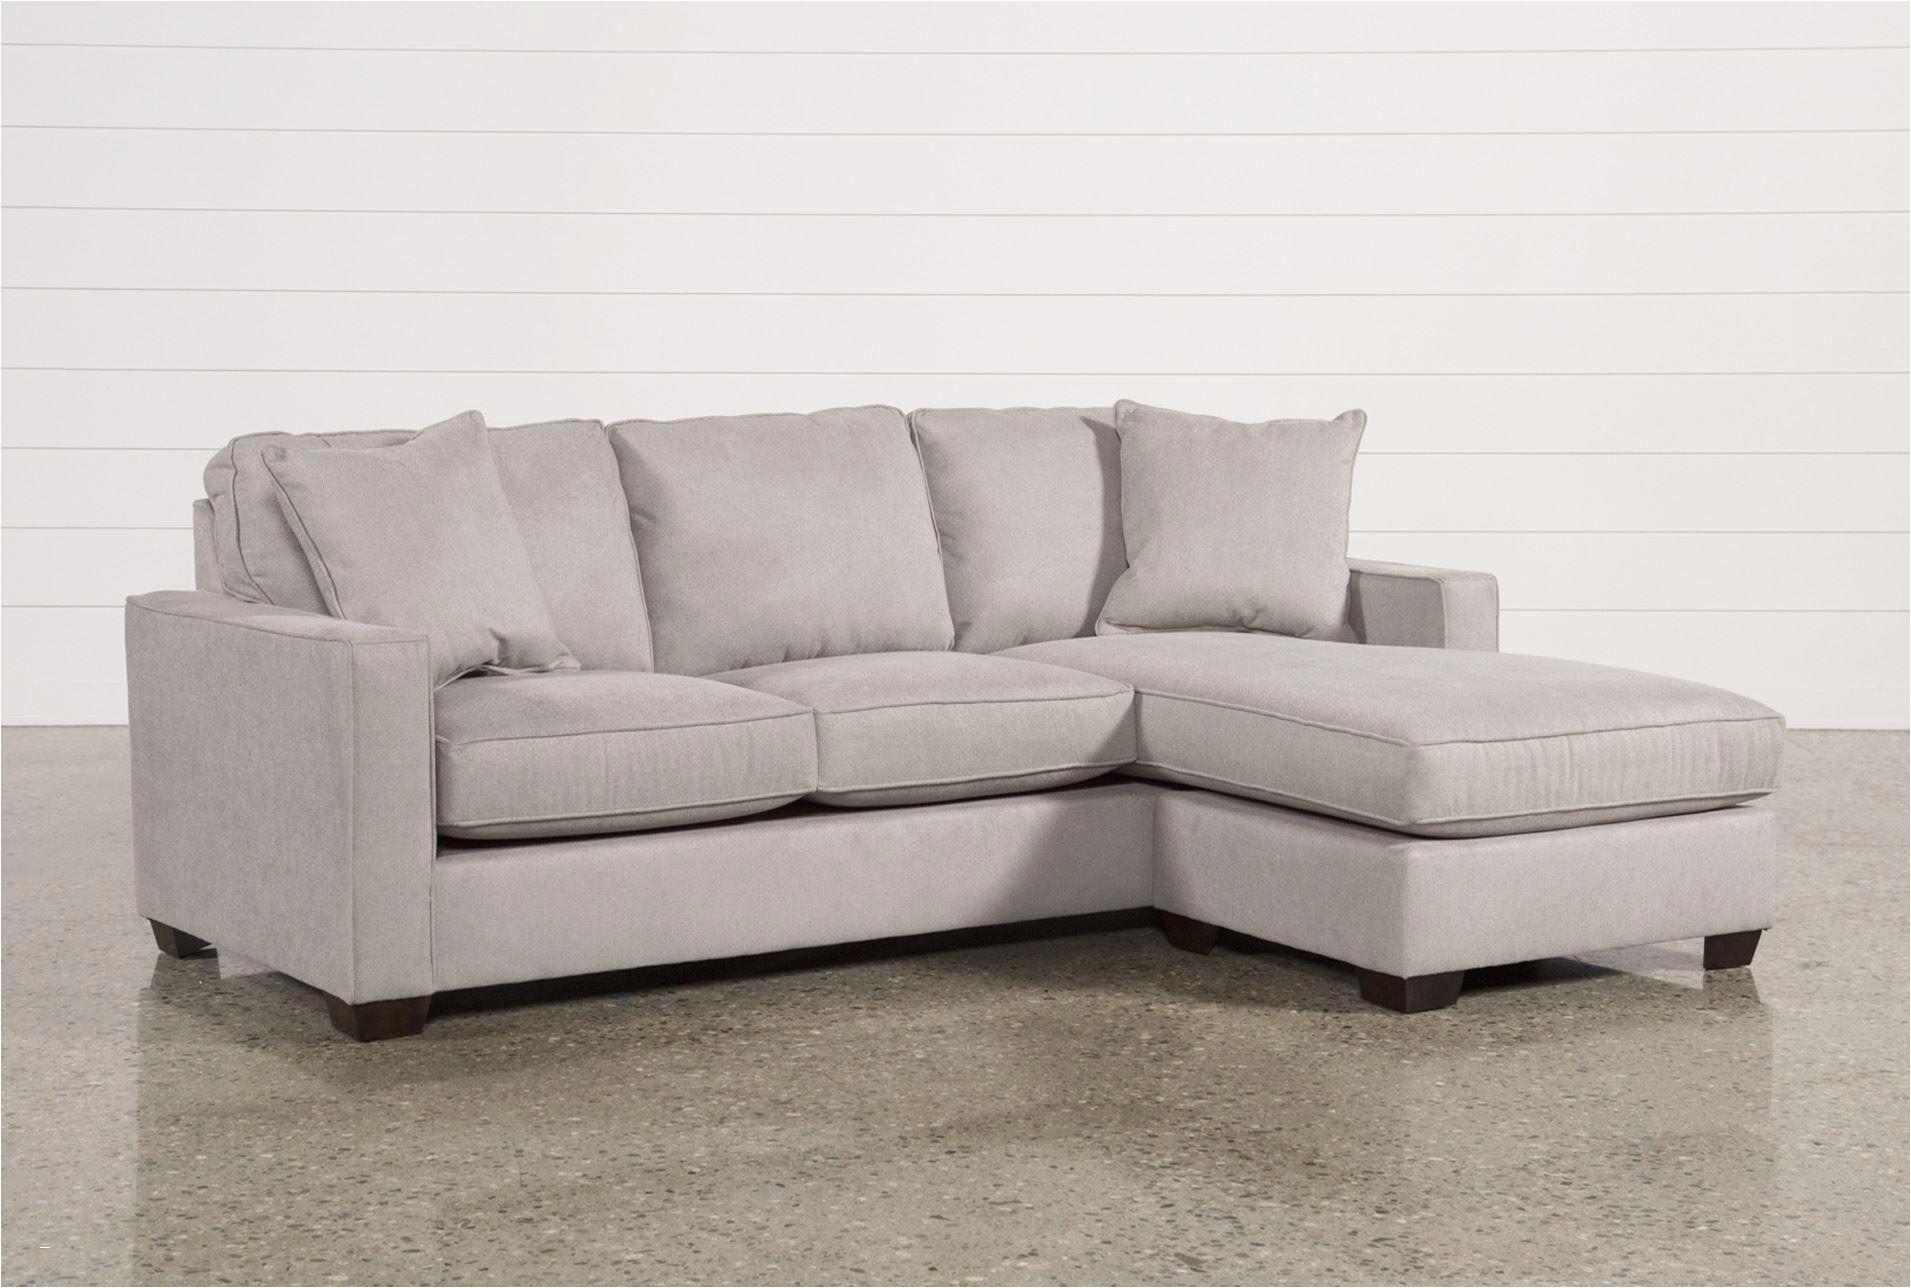 69 Best Mid Century Sectional sofa Model